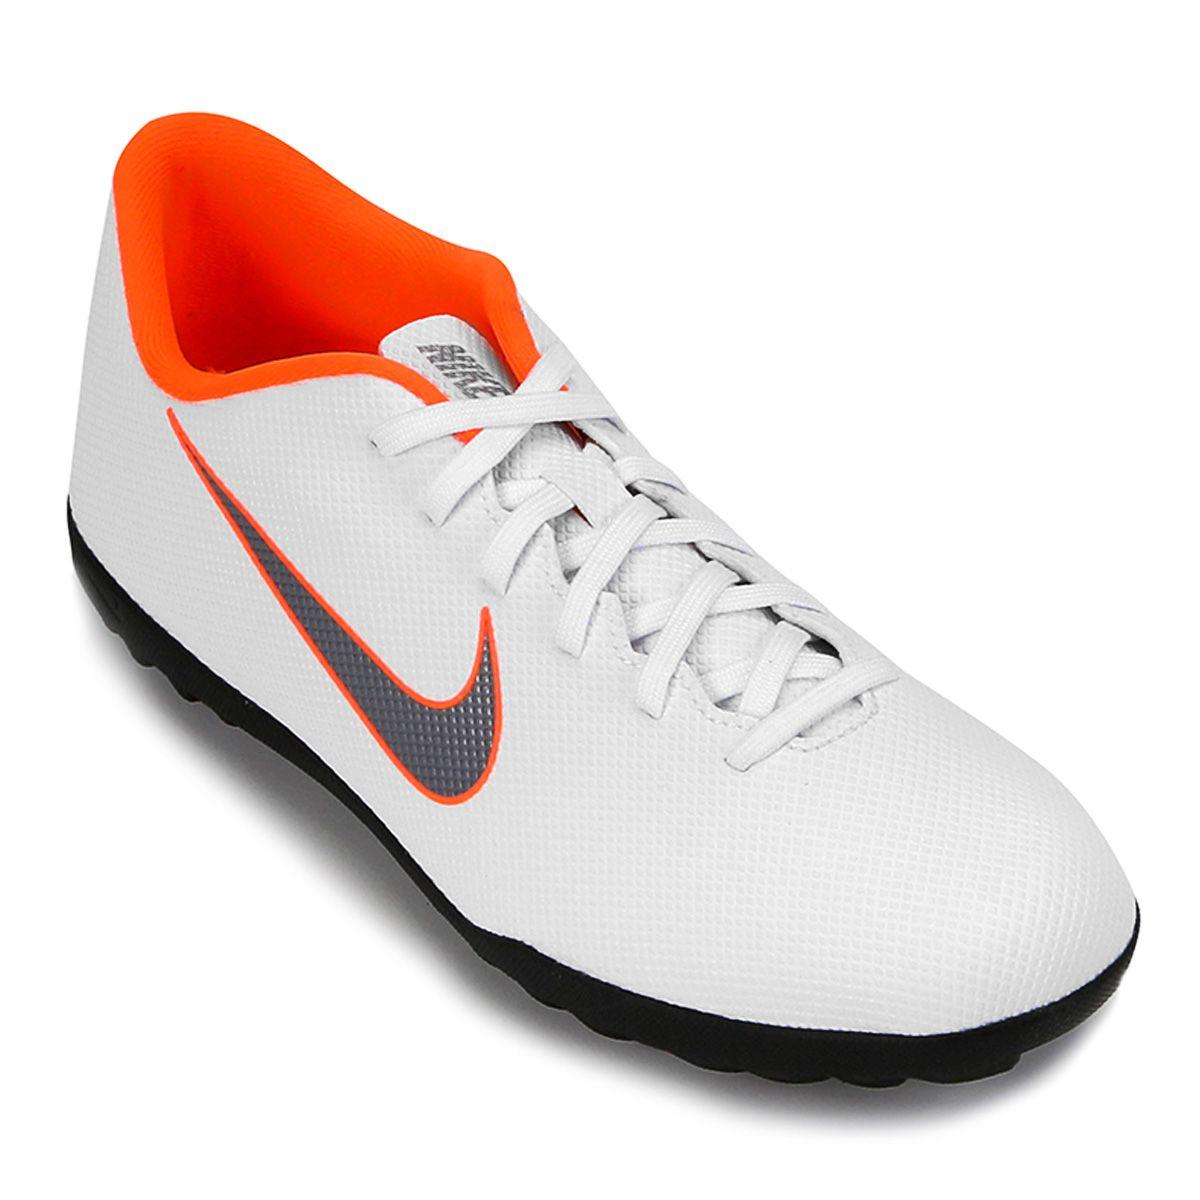 543242ee3b Chuteira Society Nike Mercurial Vaporx 12 Club Tf - BRACIA SHOP ...